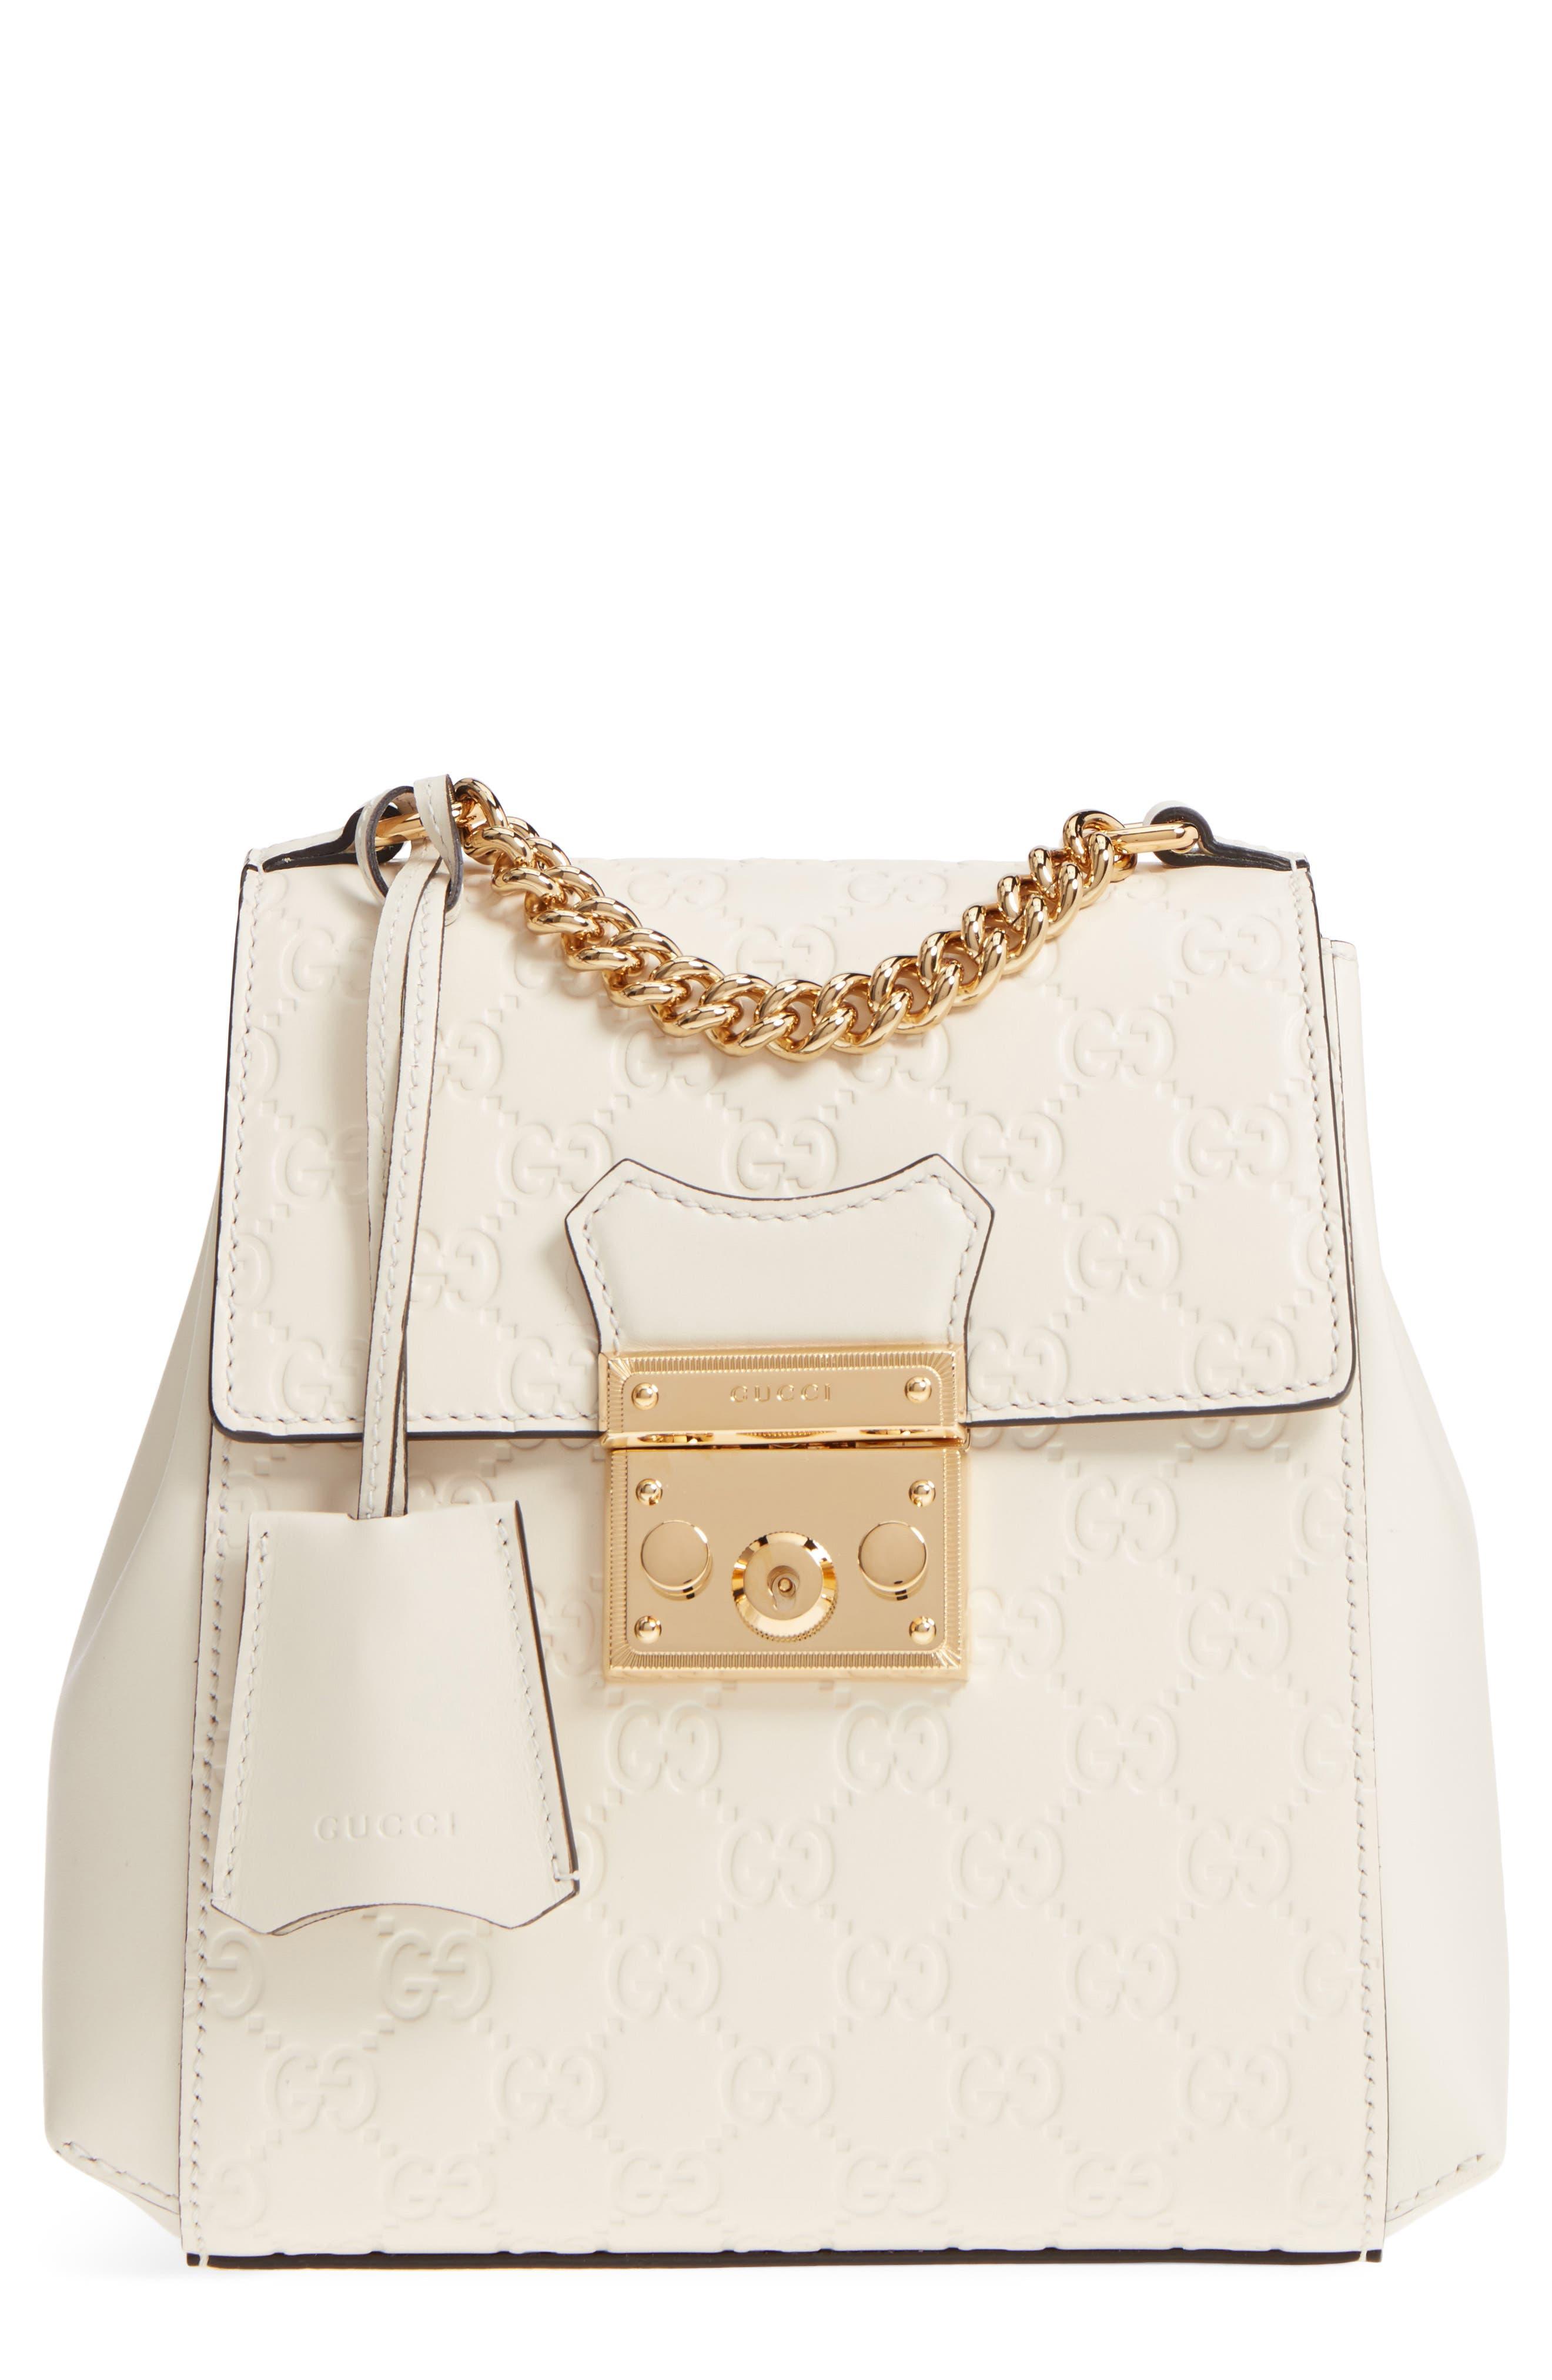 GG Supreme Leather Padlock Backpack,                             Main thumbnail 1, color,                             MYSTIC WHITE/ MYSTIC WHITE